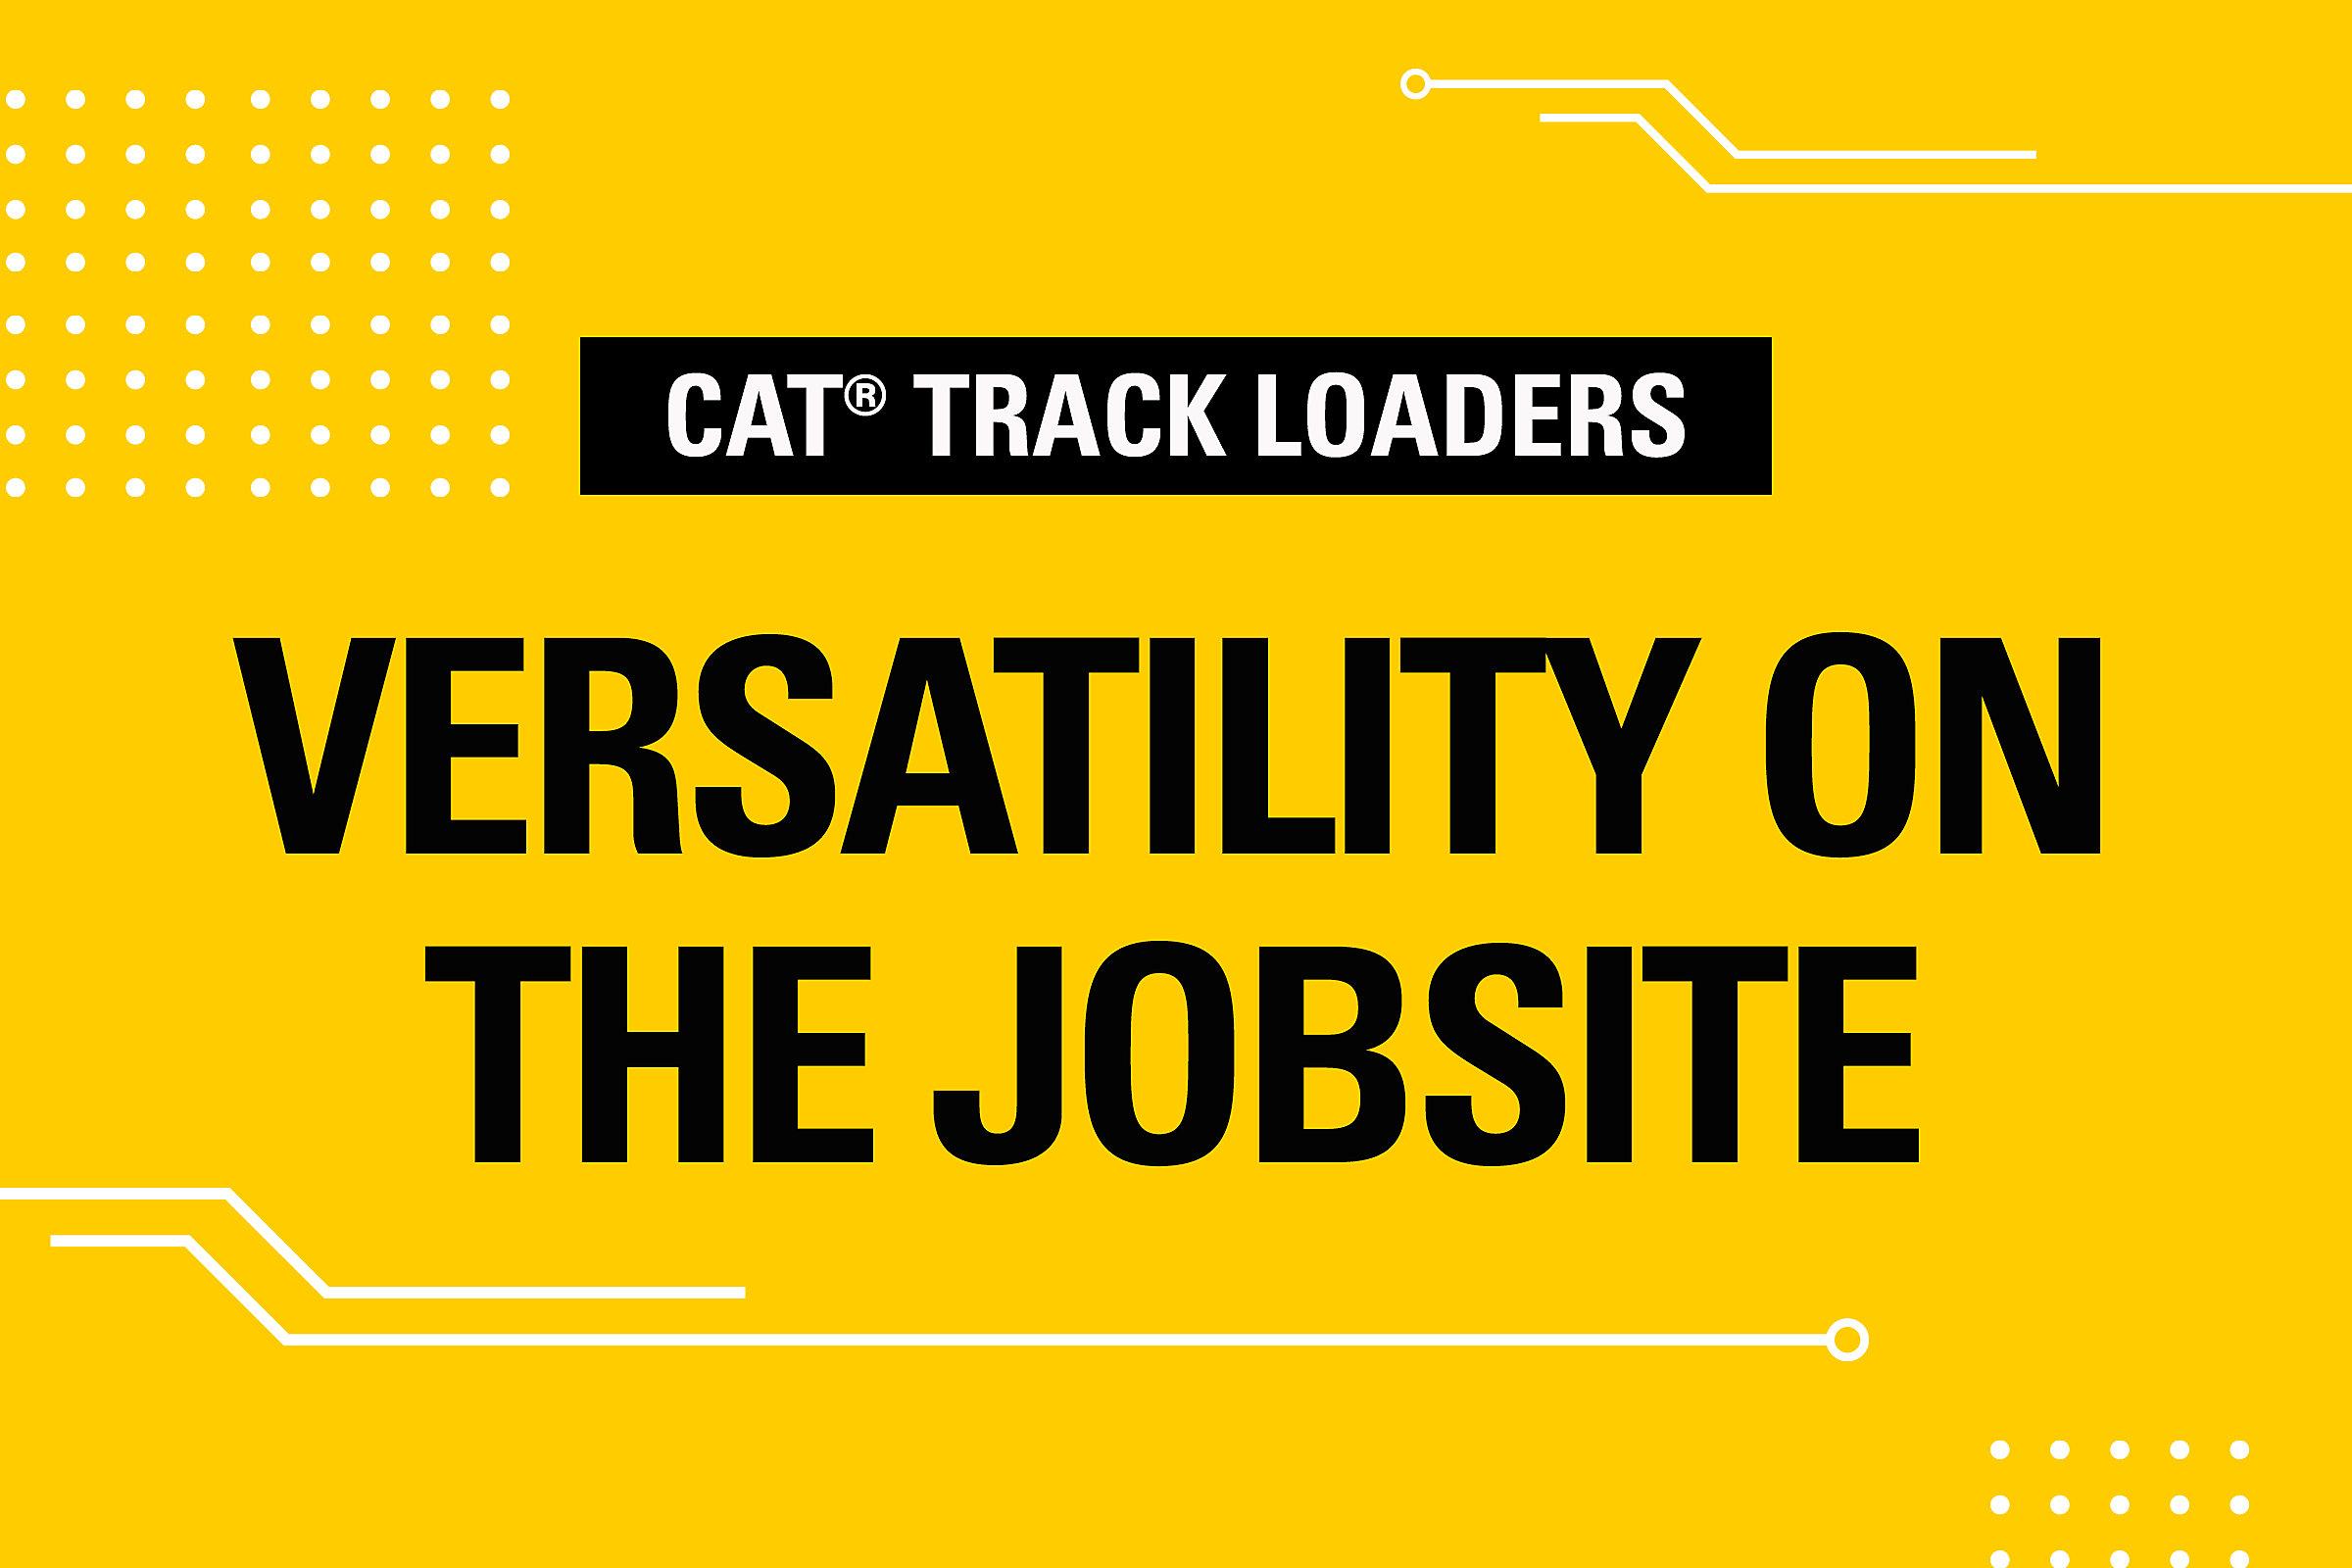 Versatility on the Jobsite